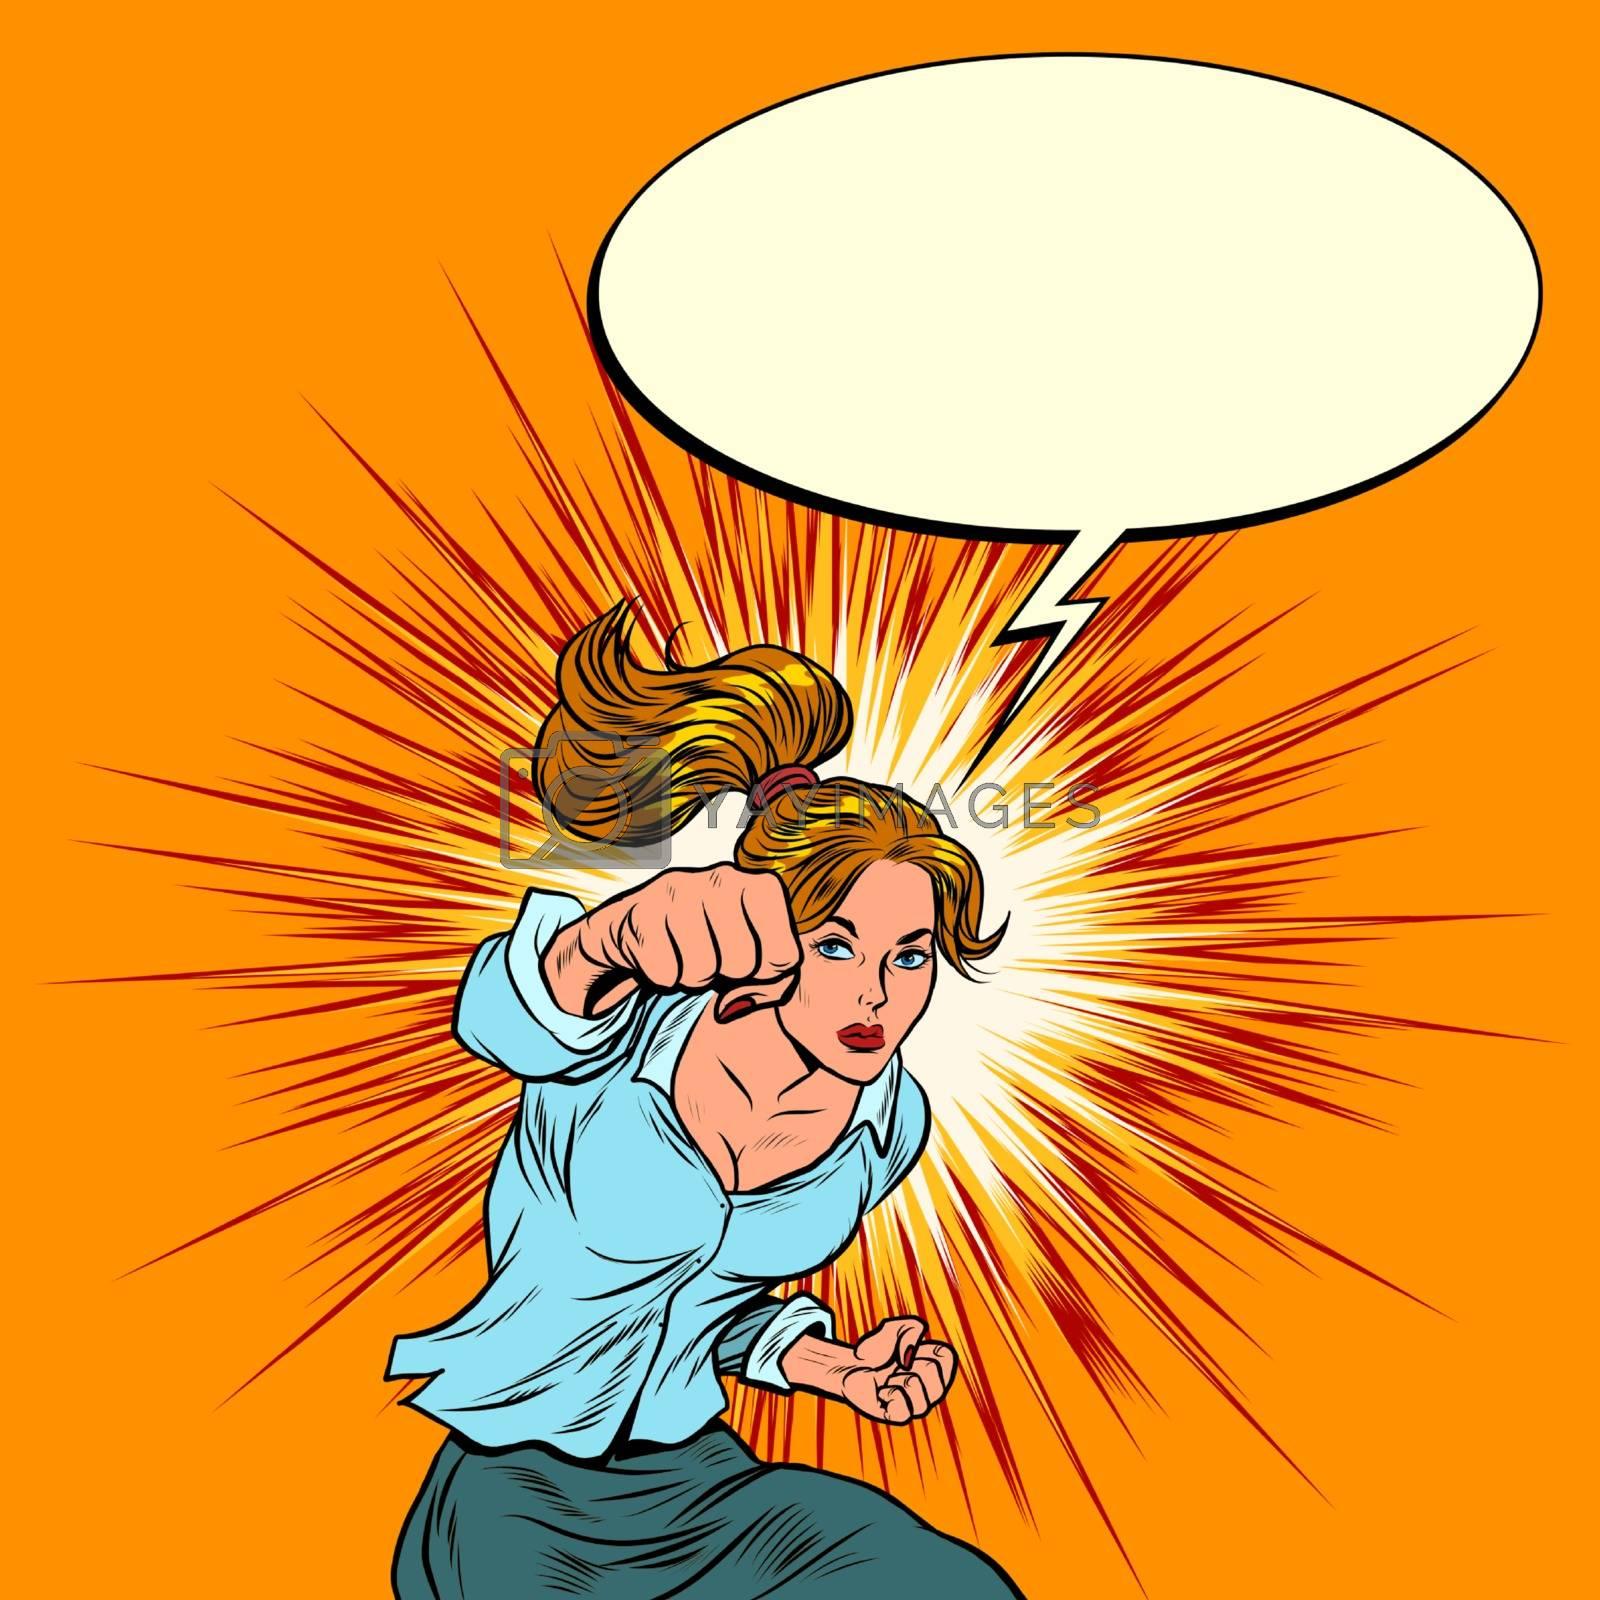 Female force is a blow. Feminism. Pop art retro vector illustration kitsch vintage 50s 60s